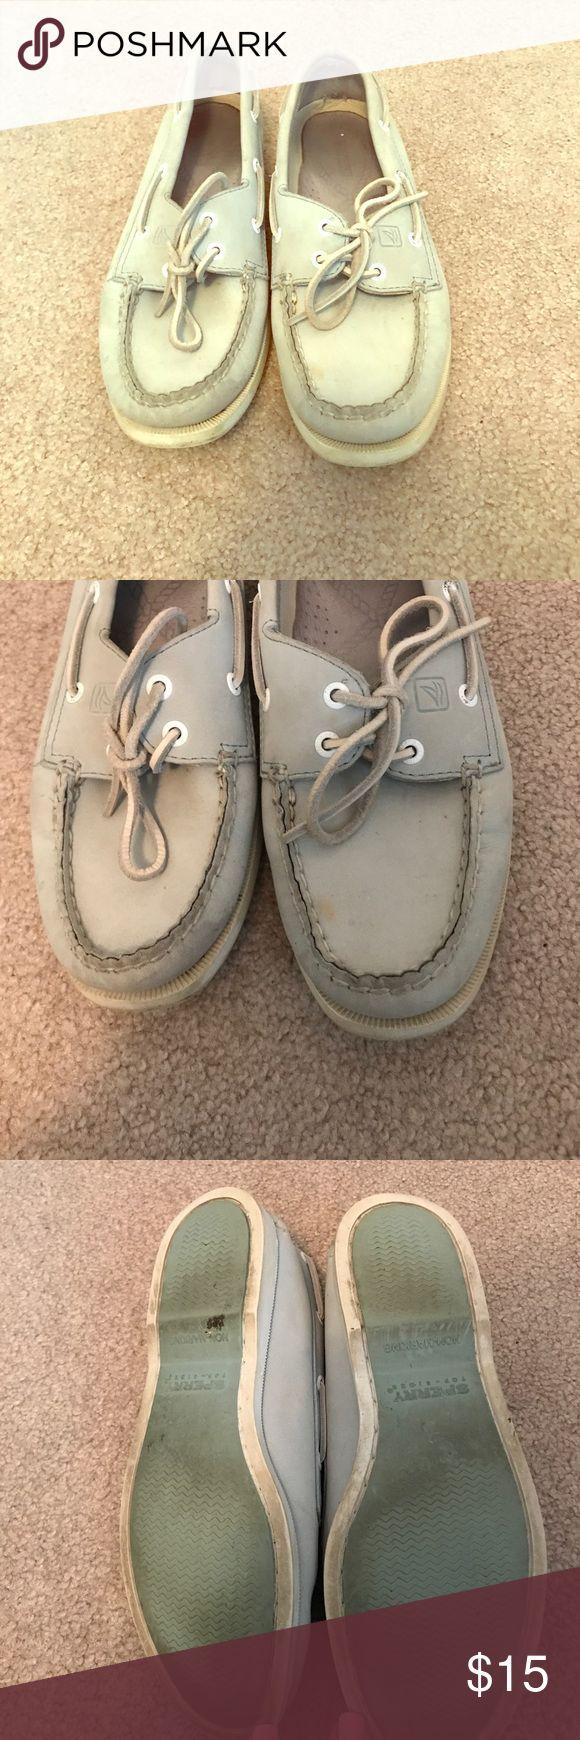 Sperry topsider Carolina blue size 7 Size 7 Sperry topsiders light Caroline blue Sperry Top-Sider Shoes Flats & Loafers